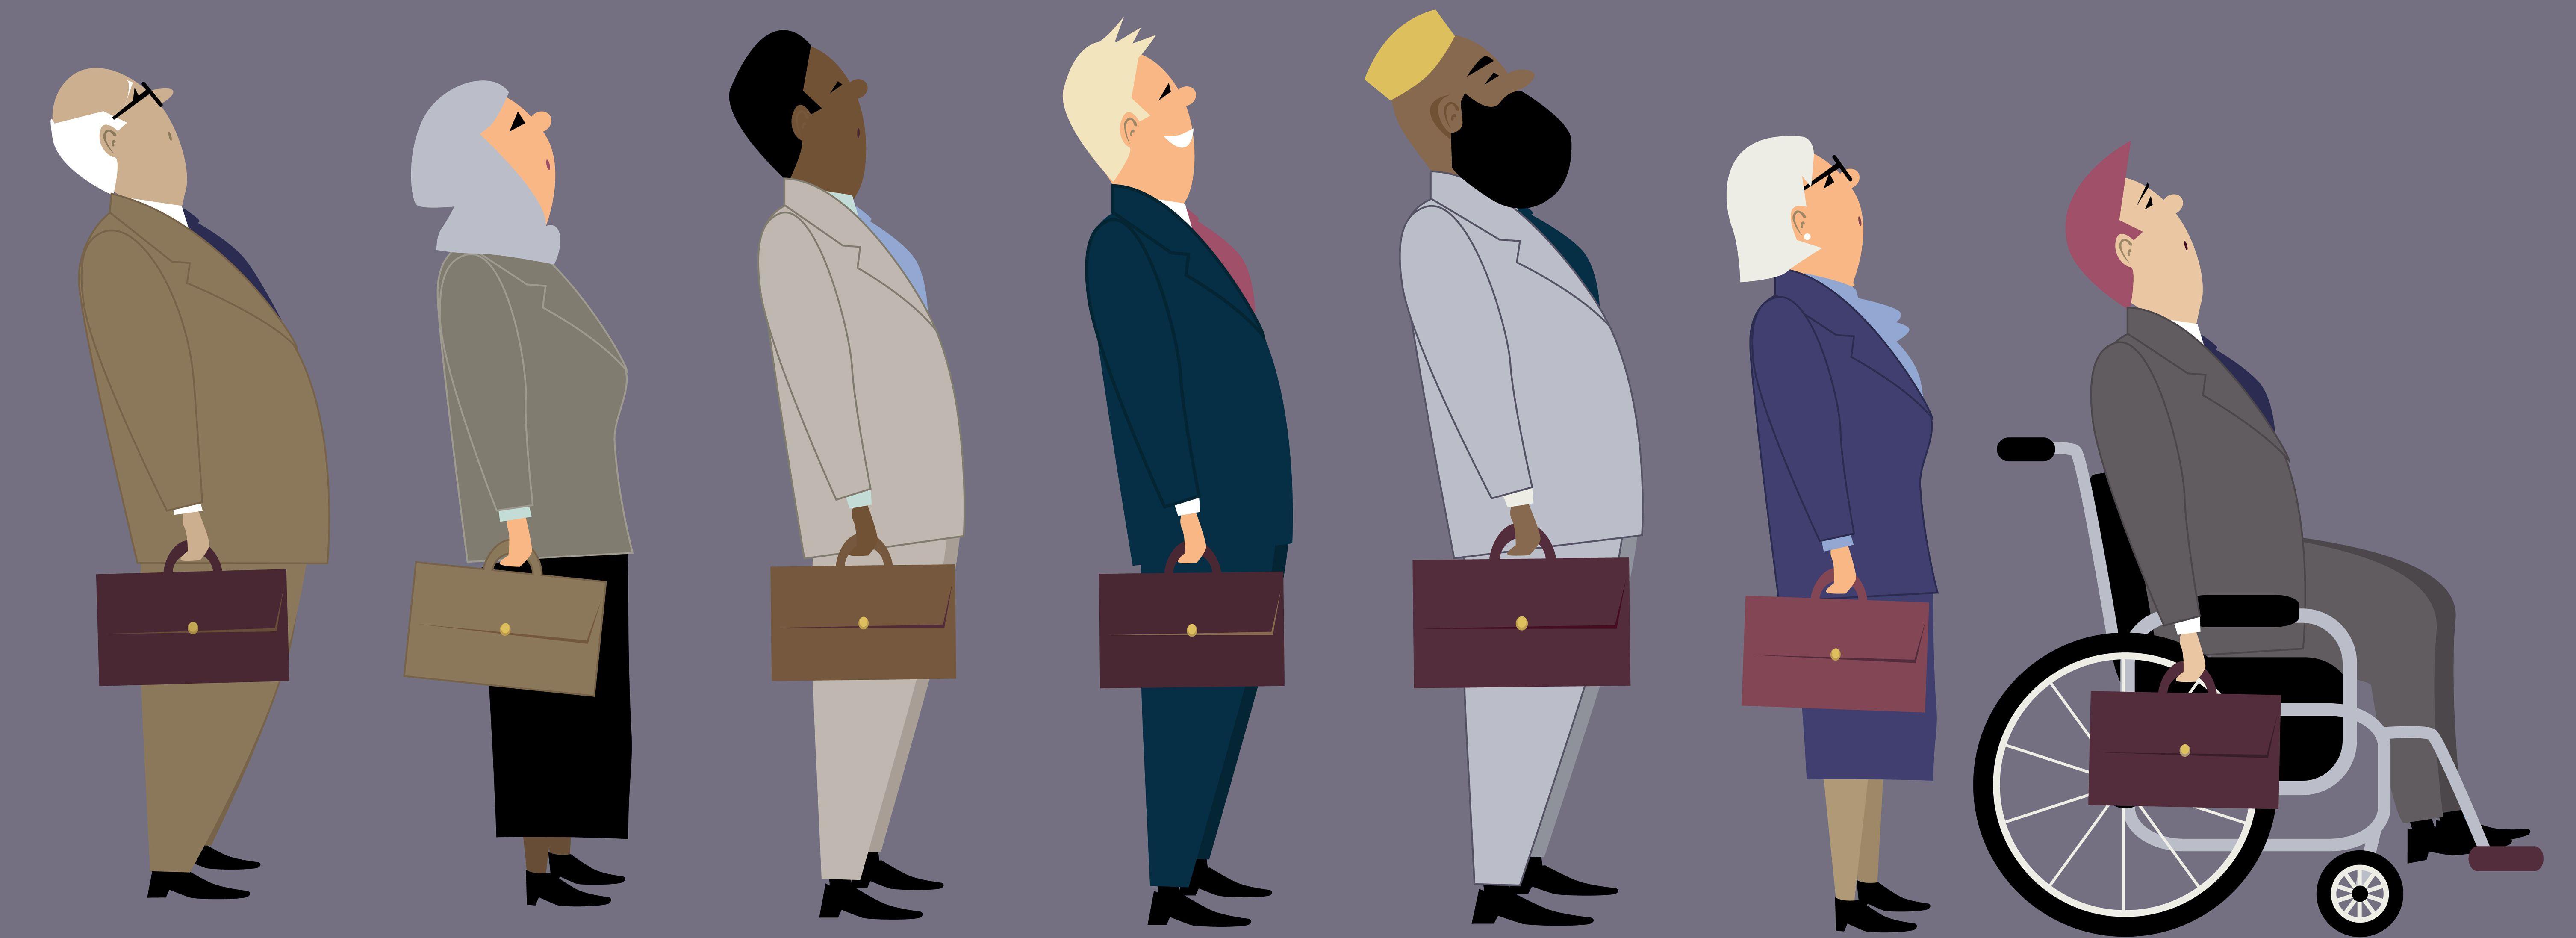 arbeidsmarktdiscriminatie